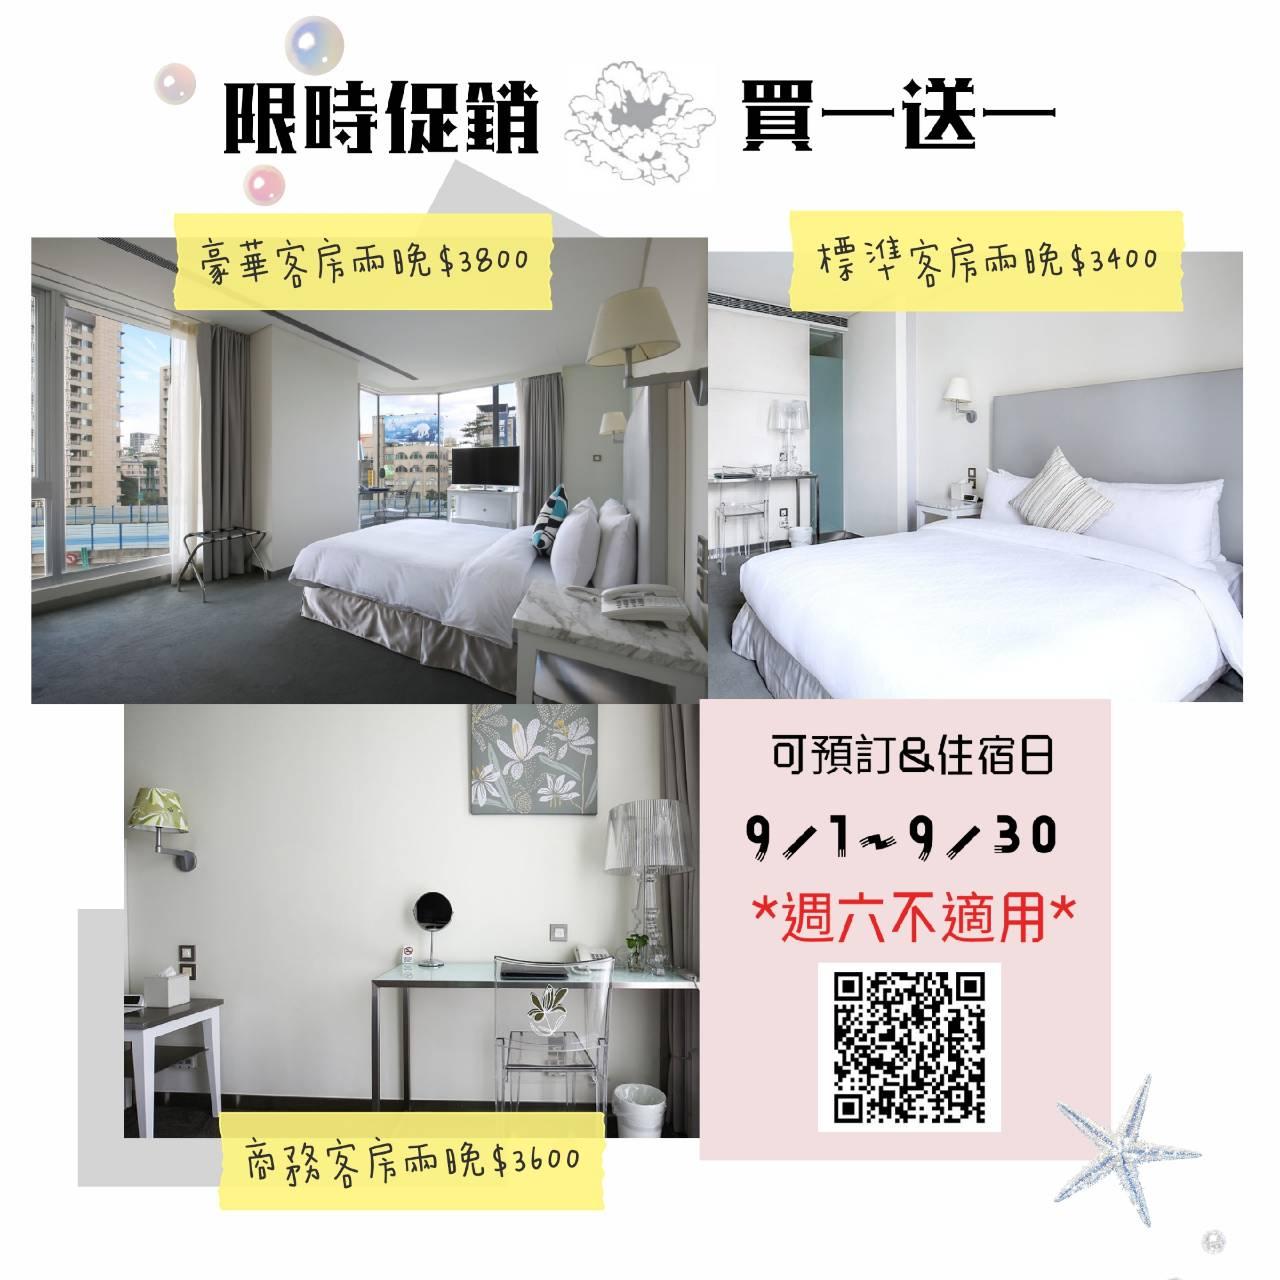 https://booking.taipeiinngroup.com/nv/images/suite/740.jpg